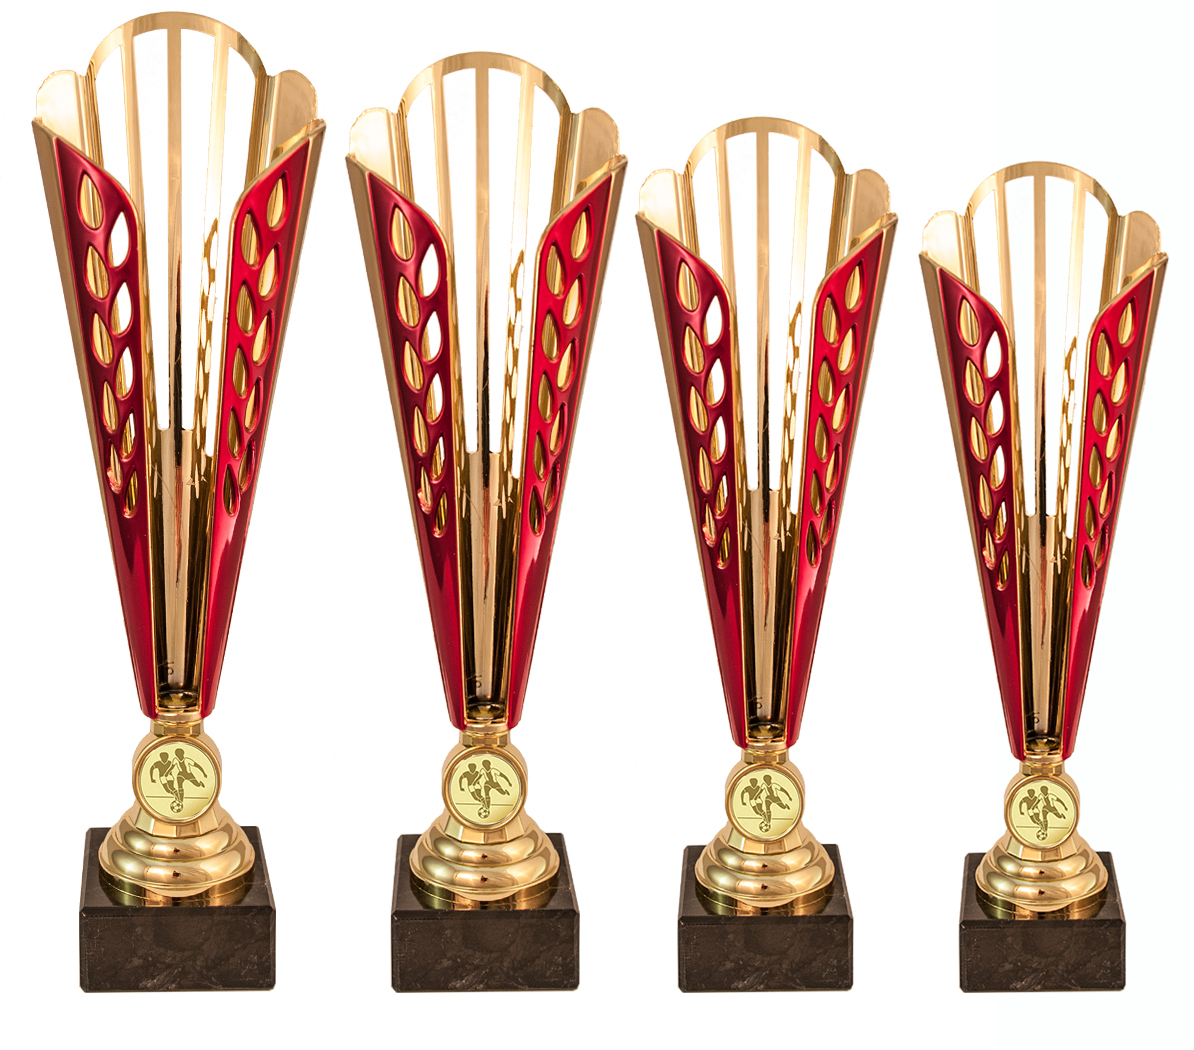 Pokale aus 4er Pokalserie: 74X181 - 74X184, 32,0 cm - 36,5 cm